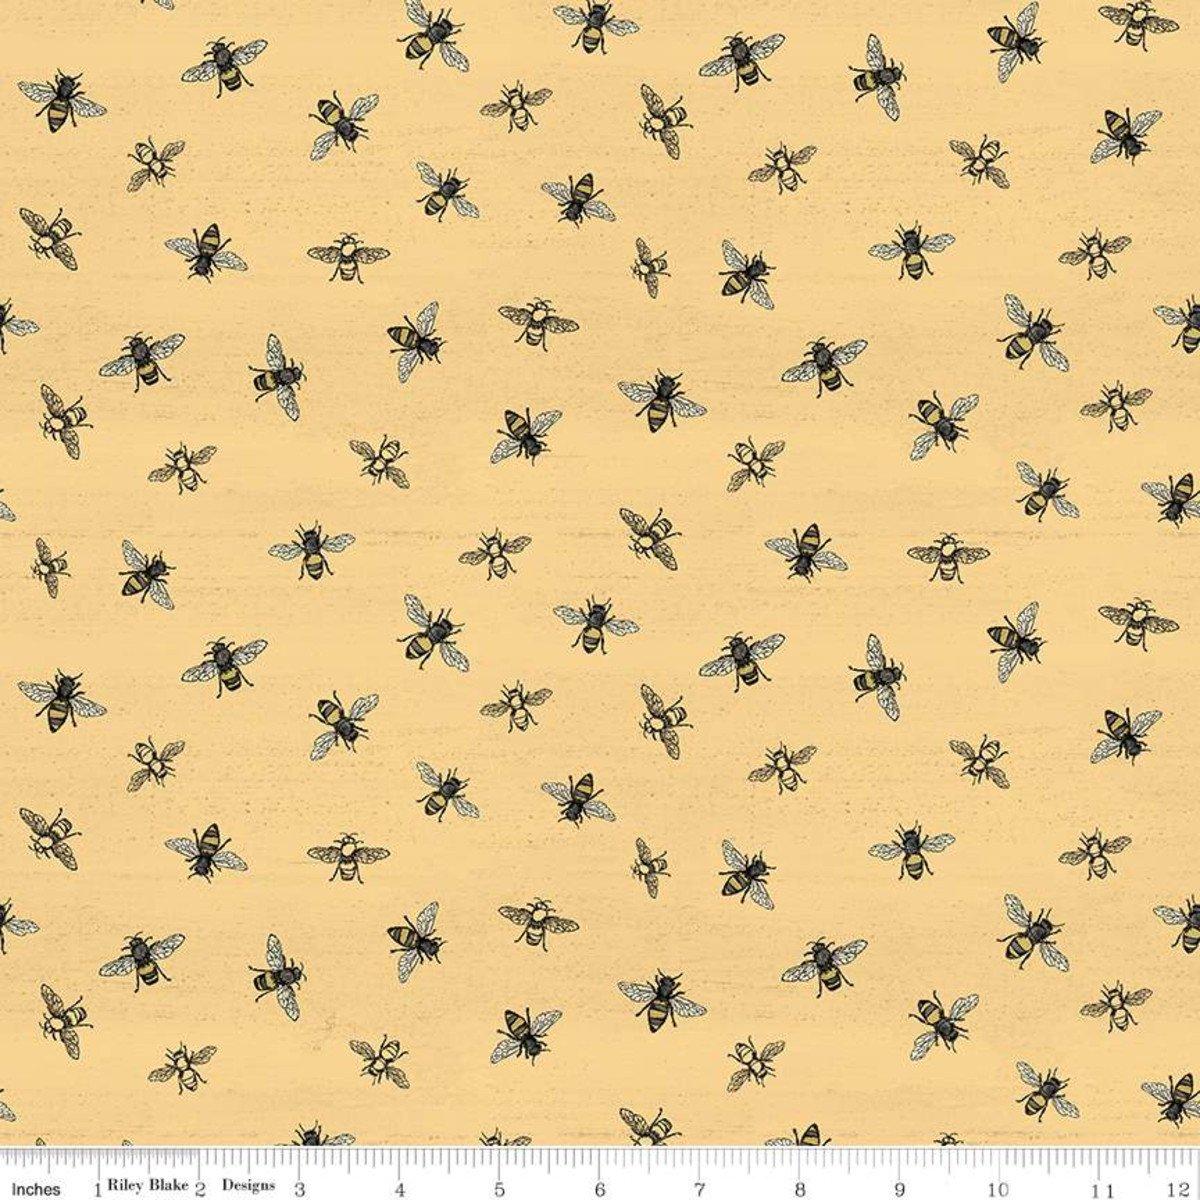 Bees Life C10103 Bees Honey